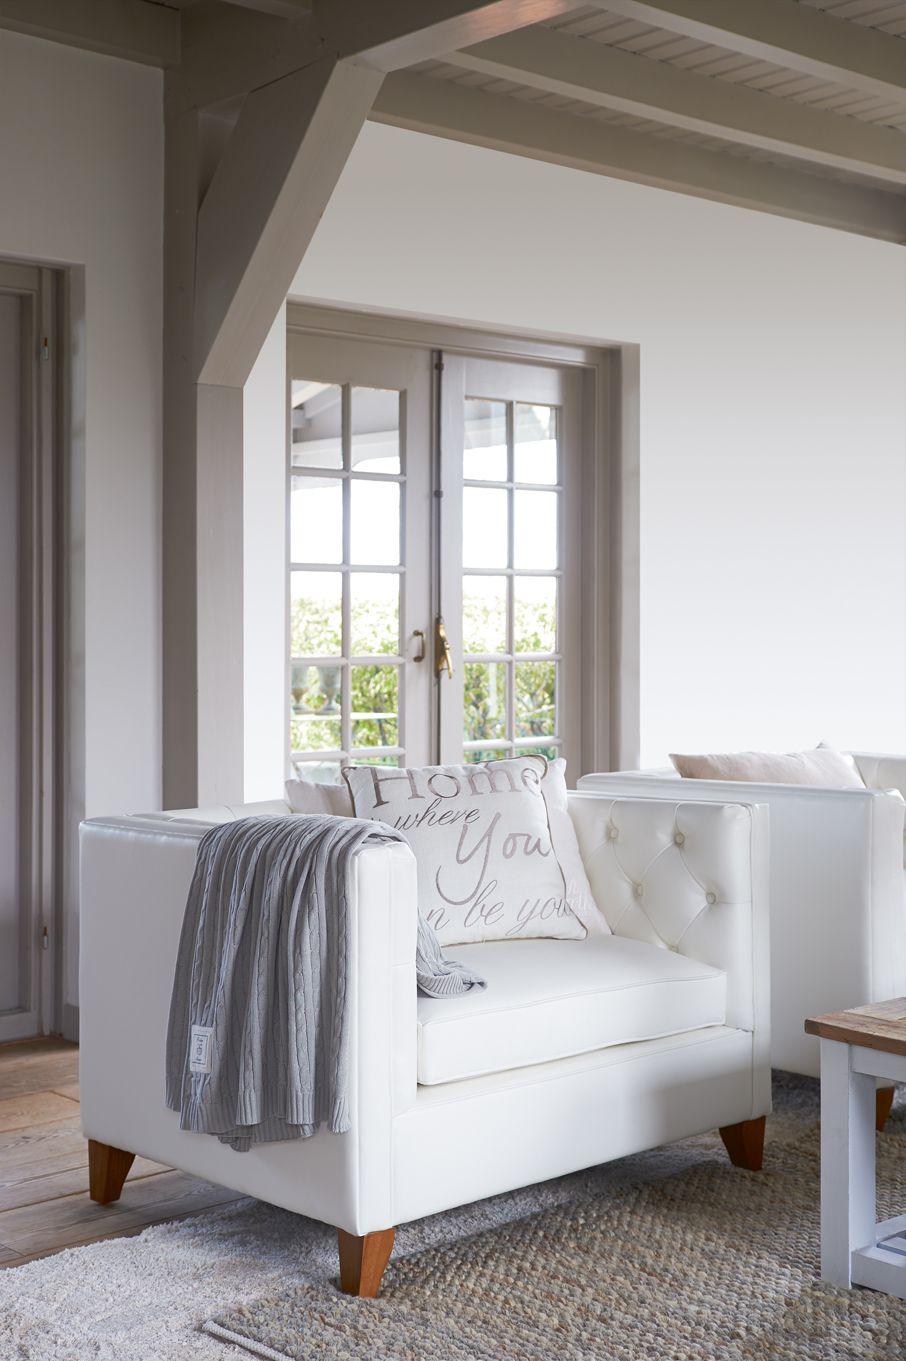 Riviera Maison sfeer aqua beige woonkamer inspiratie | Rivièra ...